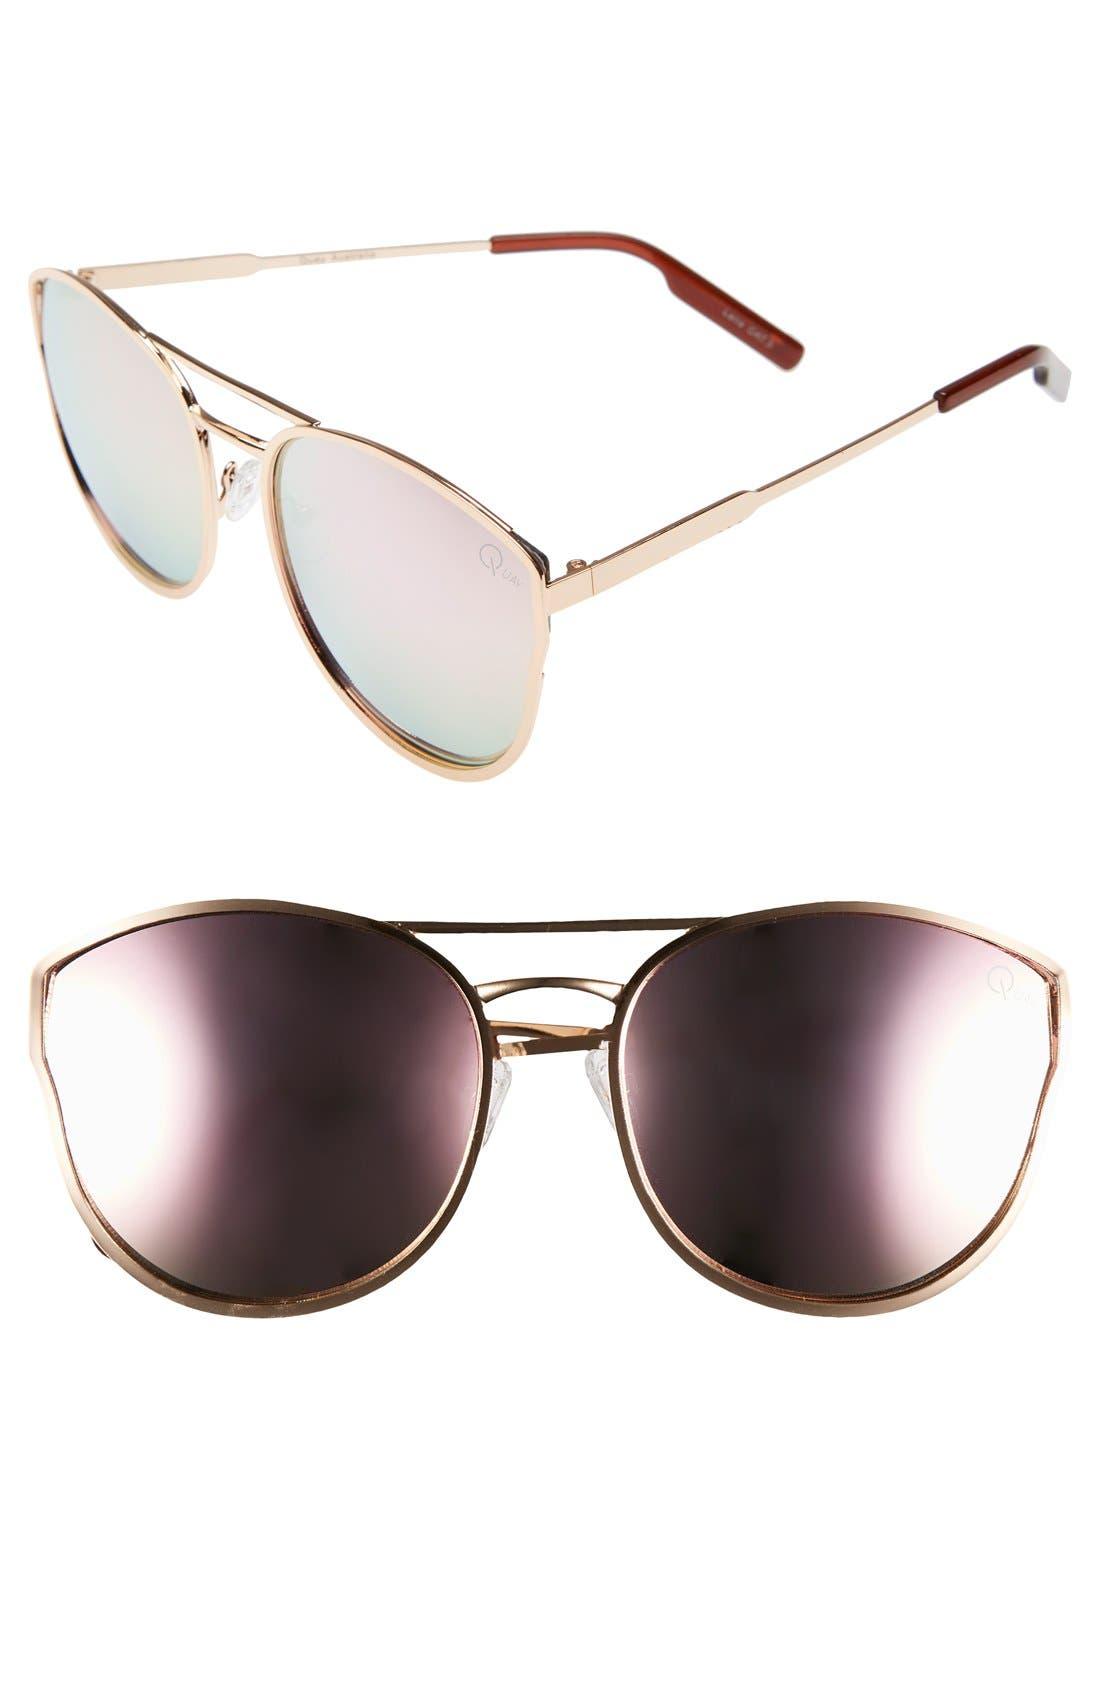 QUAY AUSTRALIA, Cherry Bomb 60mm Sunglasses, Main thumbnail 1, color, 690